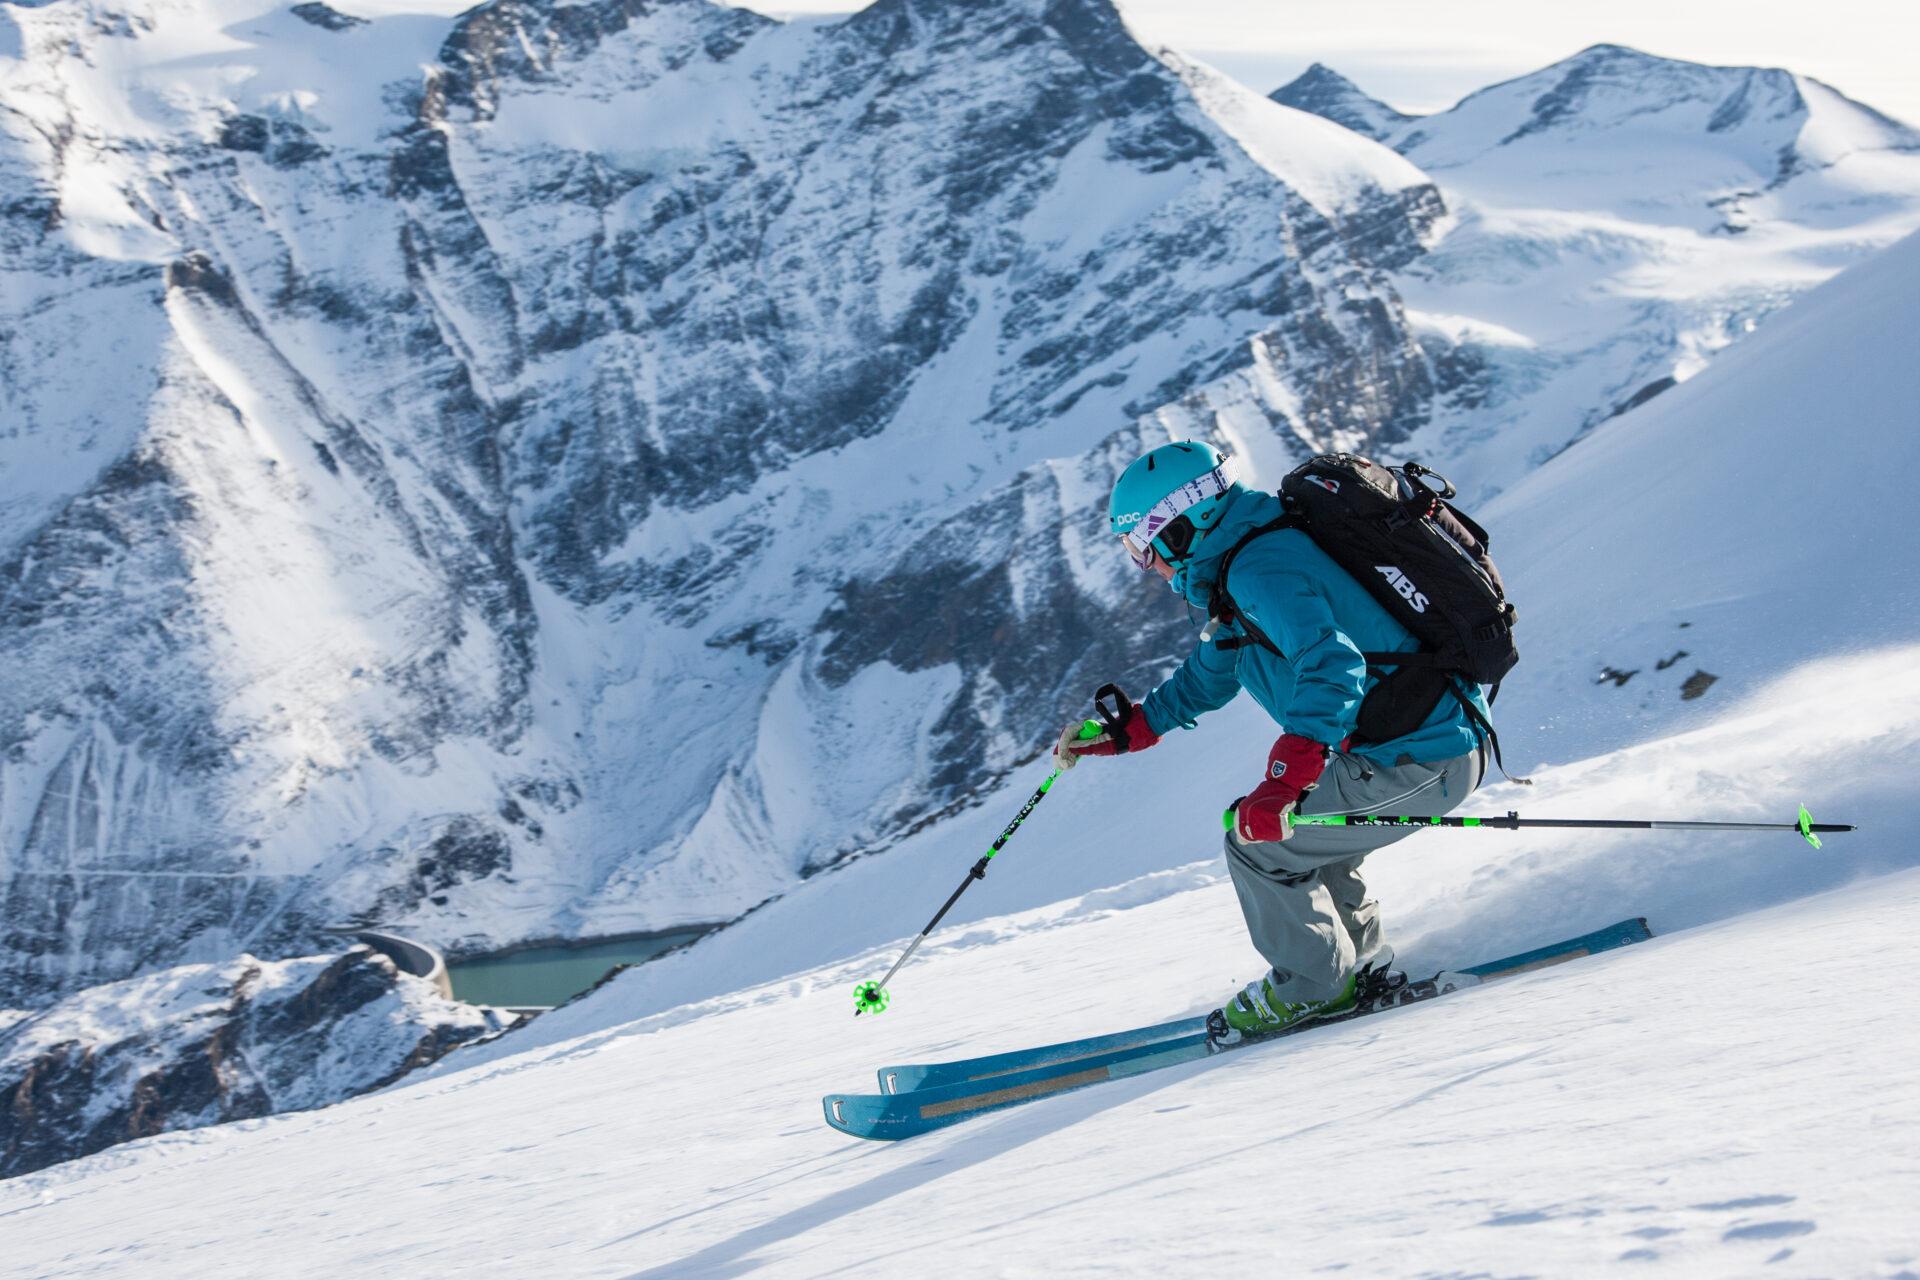 skiën en snowboarden in Livigno